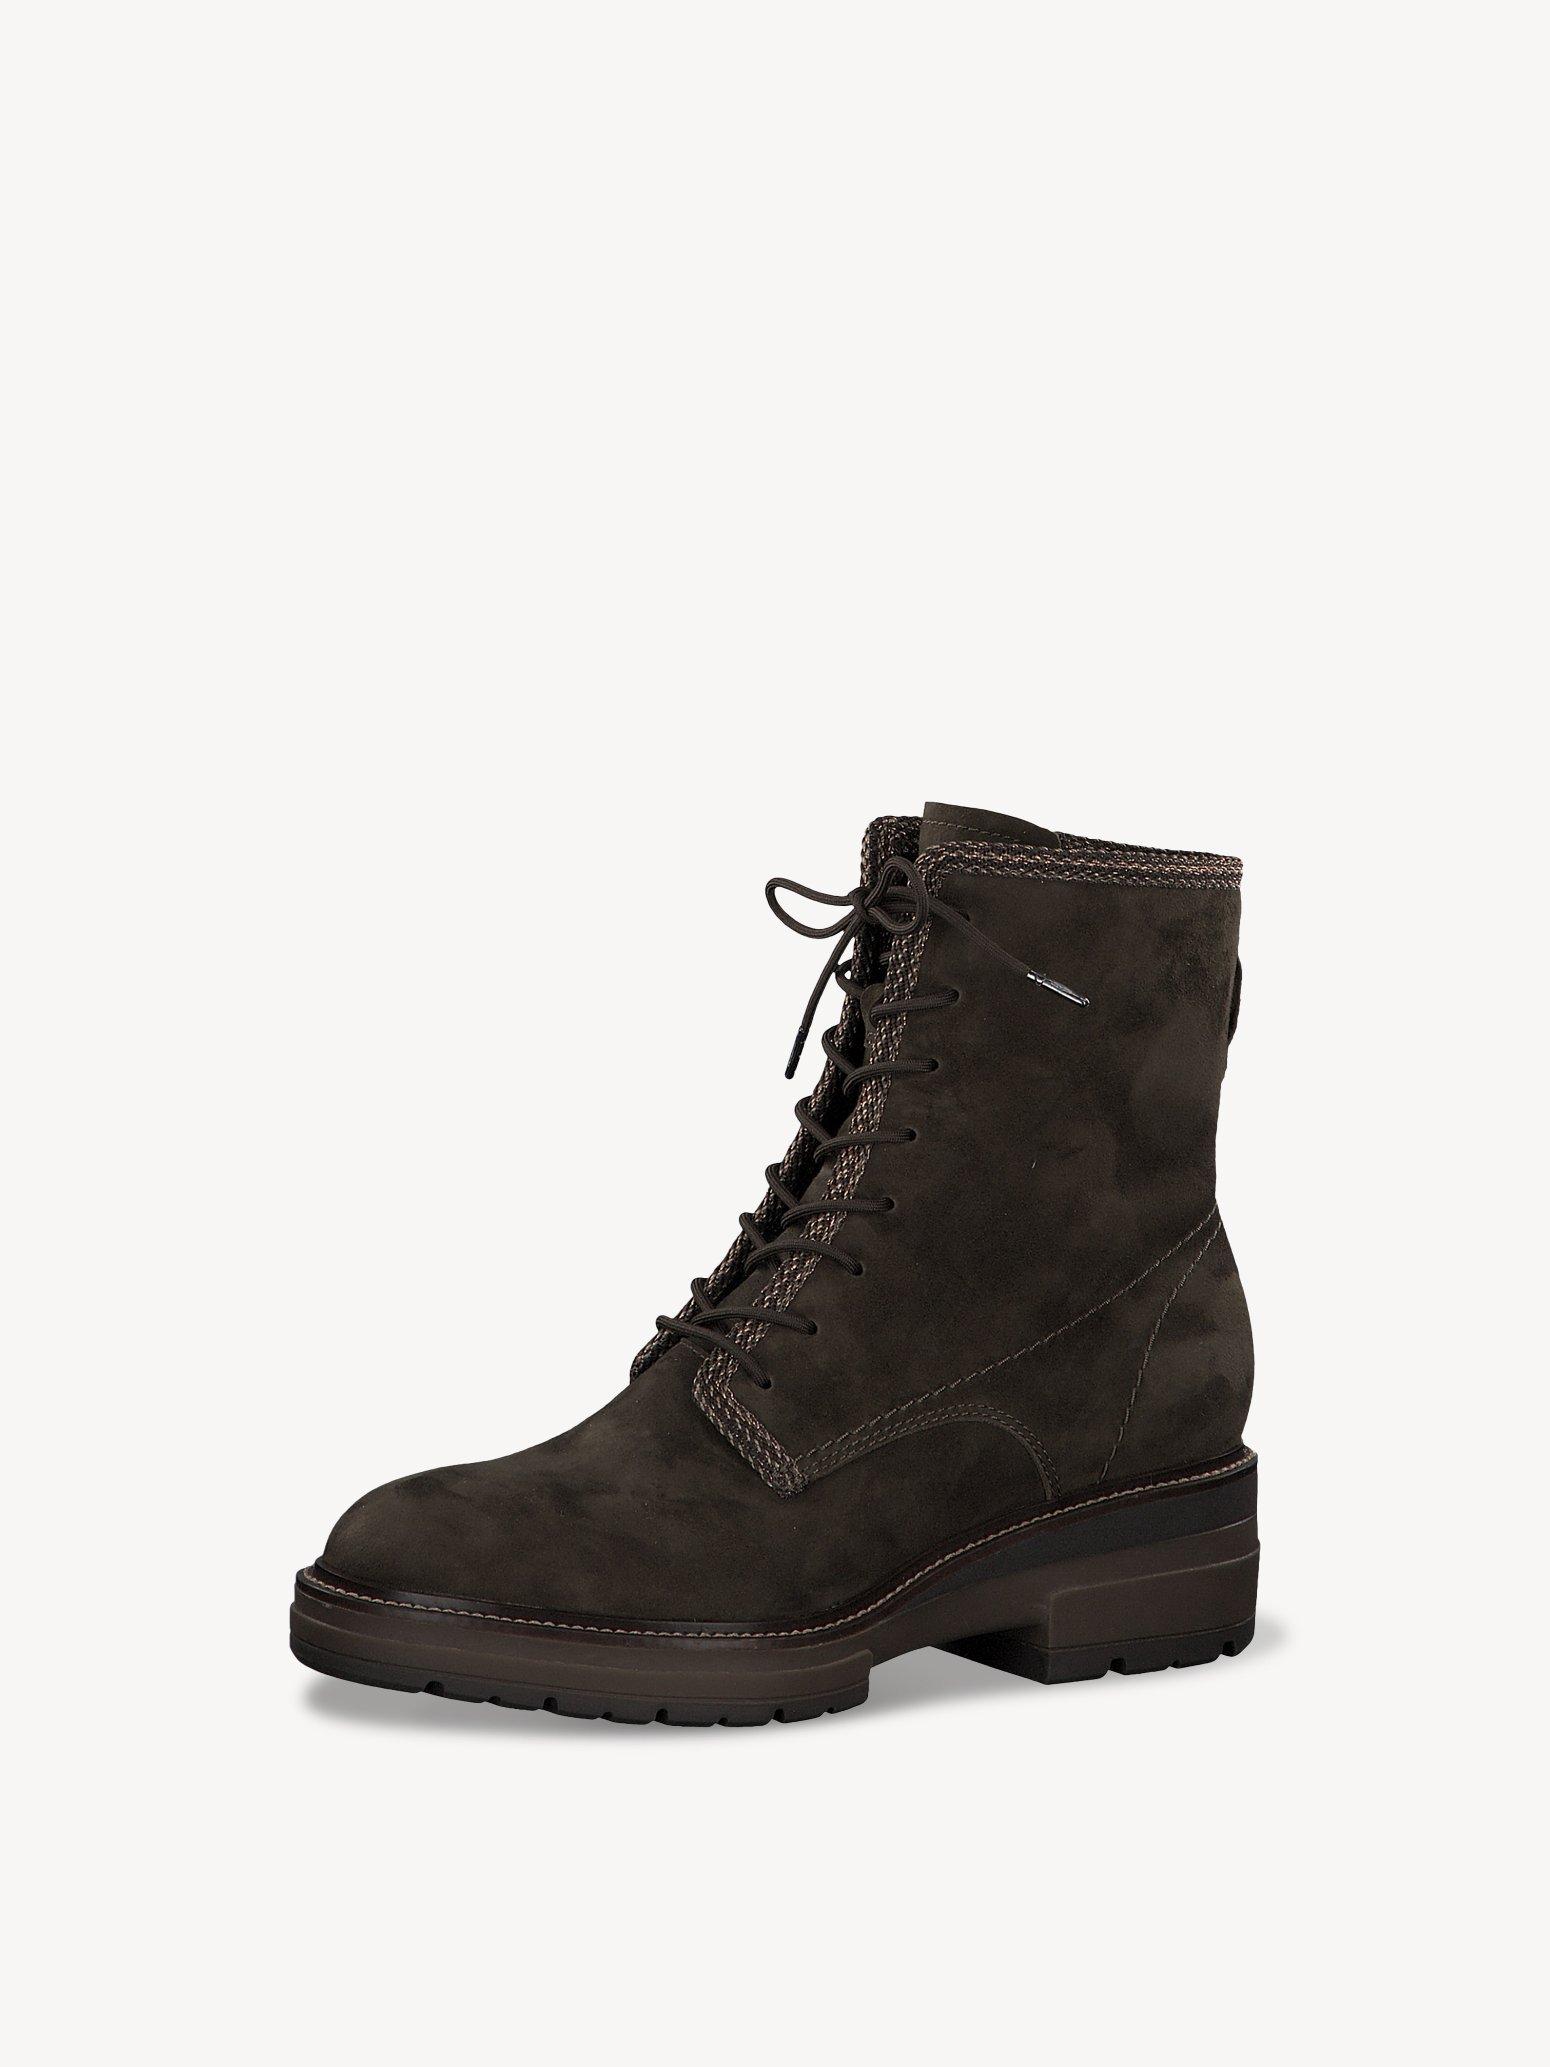 Ботинки Tamaris 1-1-25253-25-713